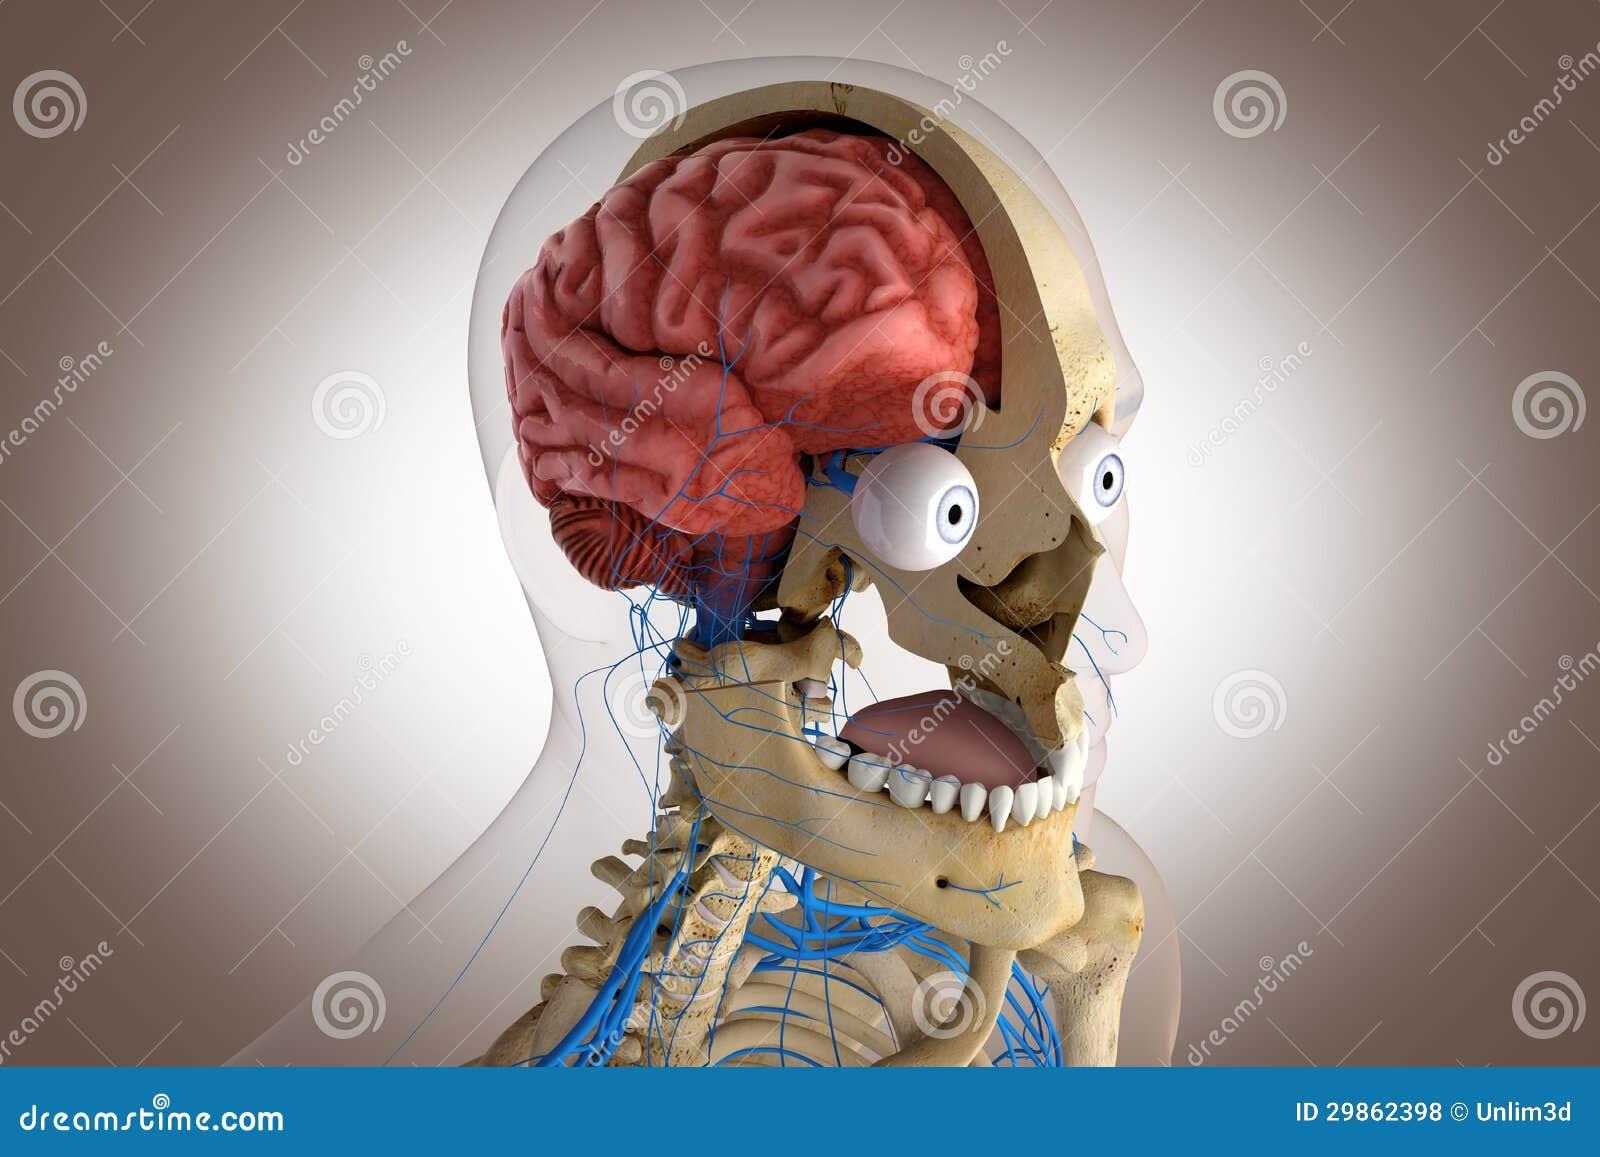 Human Anatomy Structure Of Head Brain Eyes Etc Stock Illustration